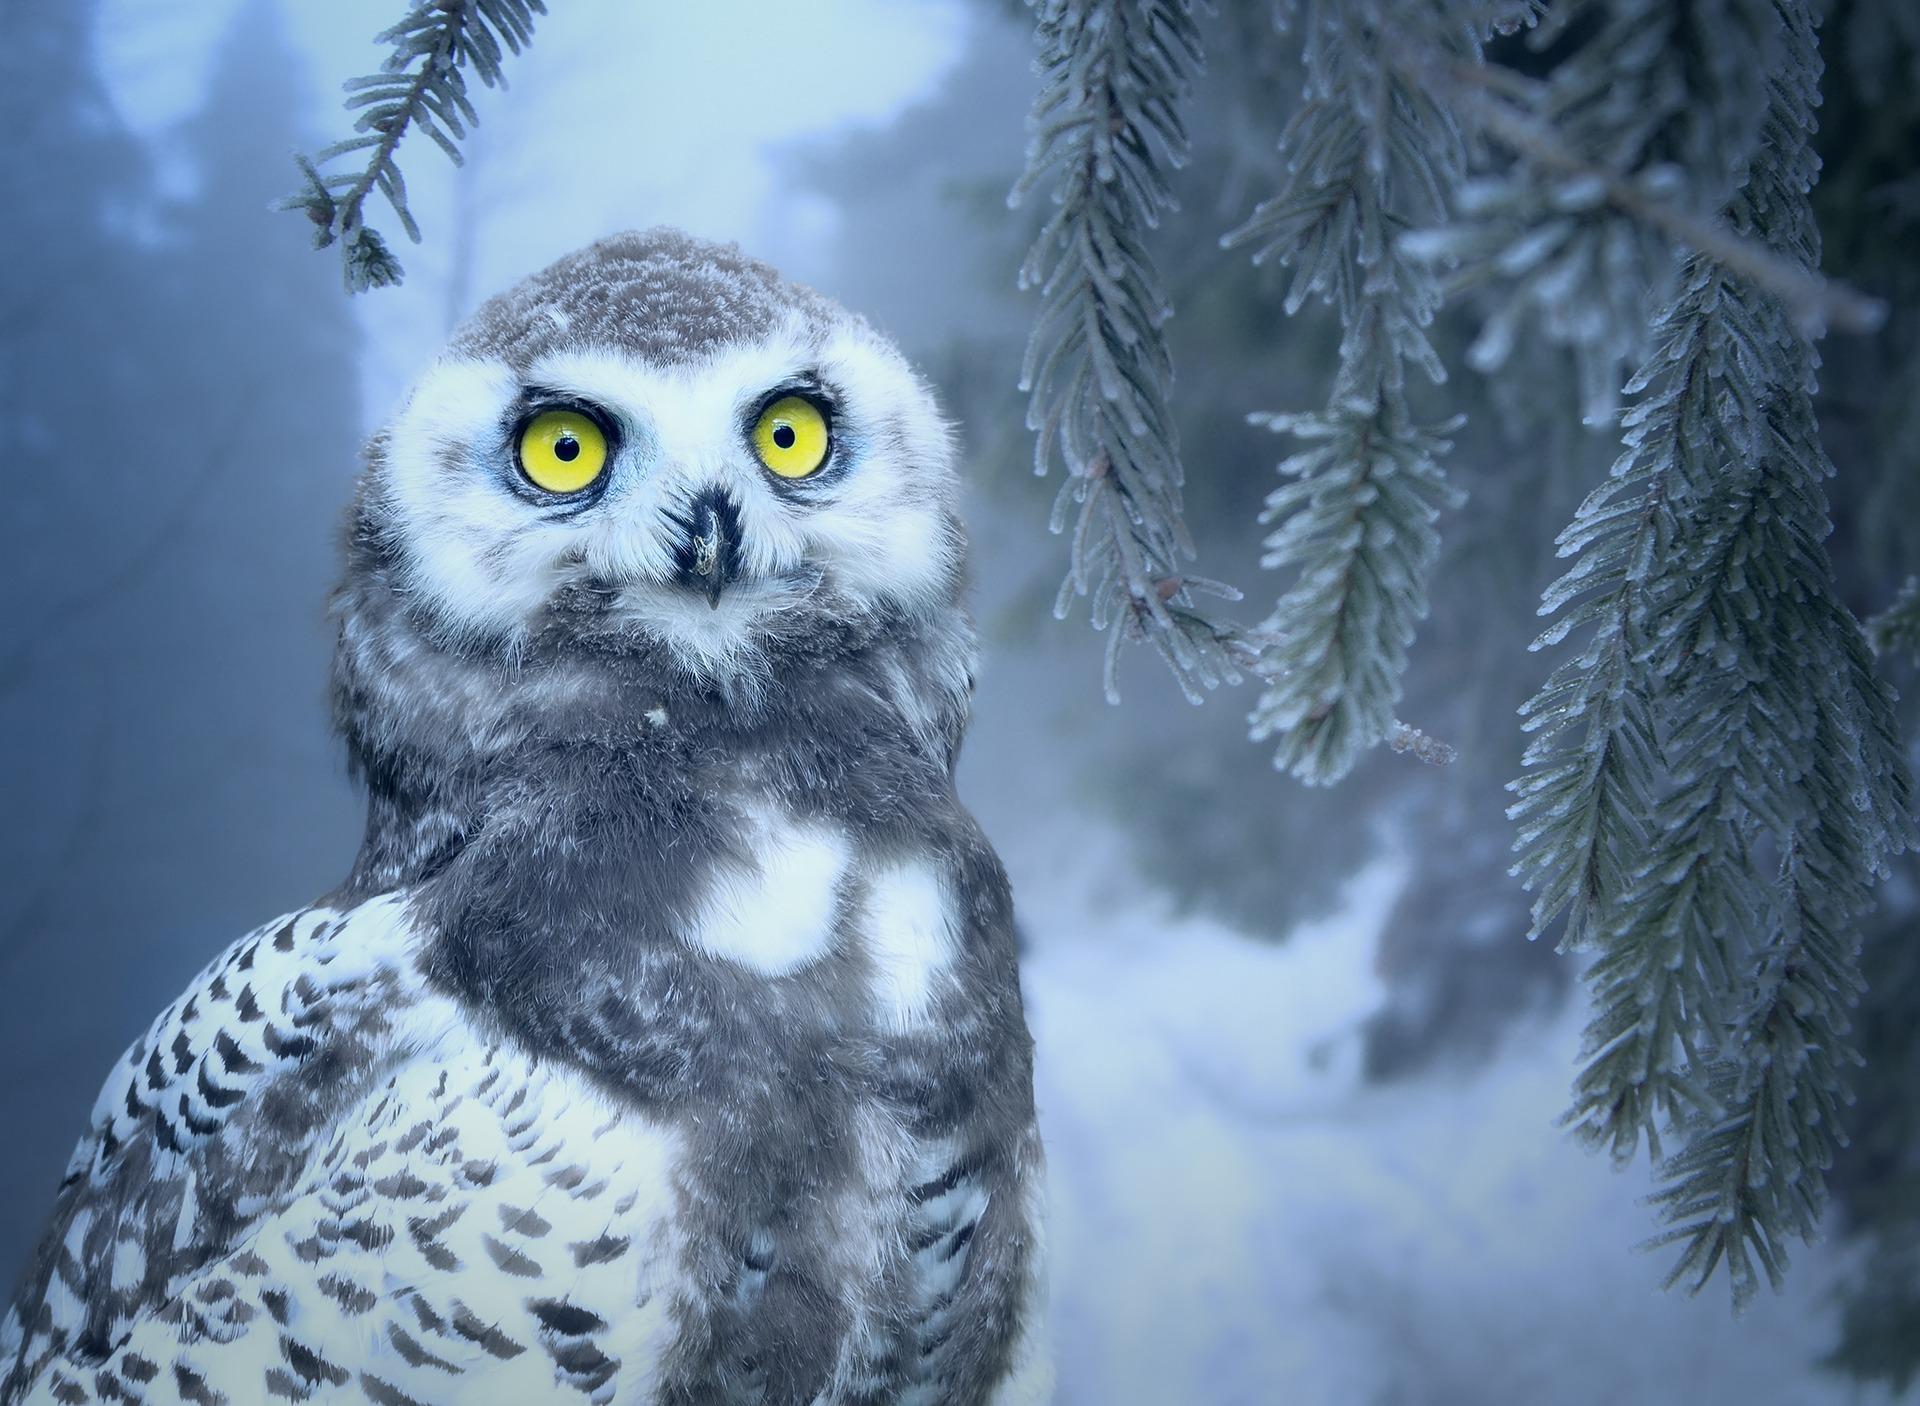 owl-3184032_1920.jpg